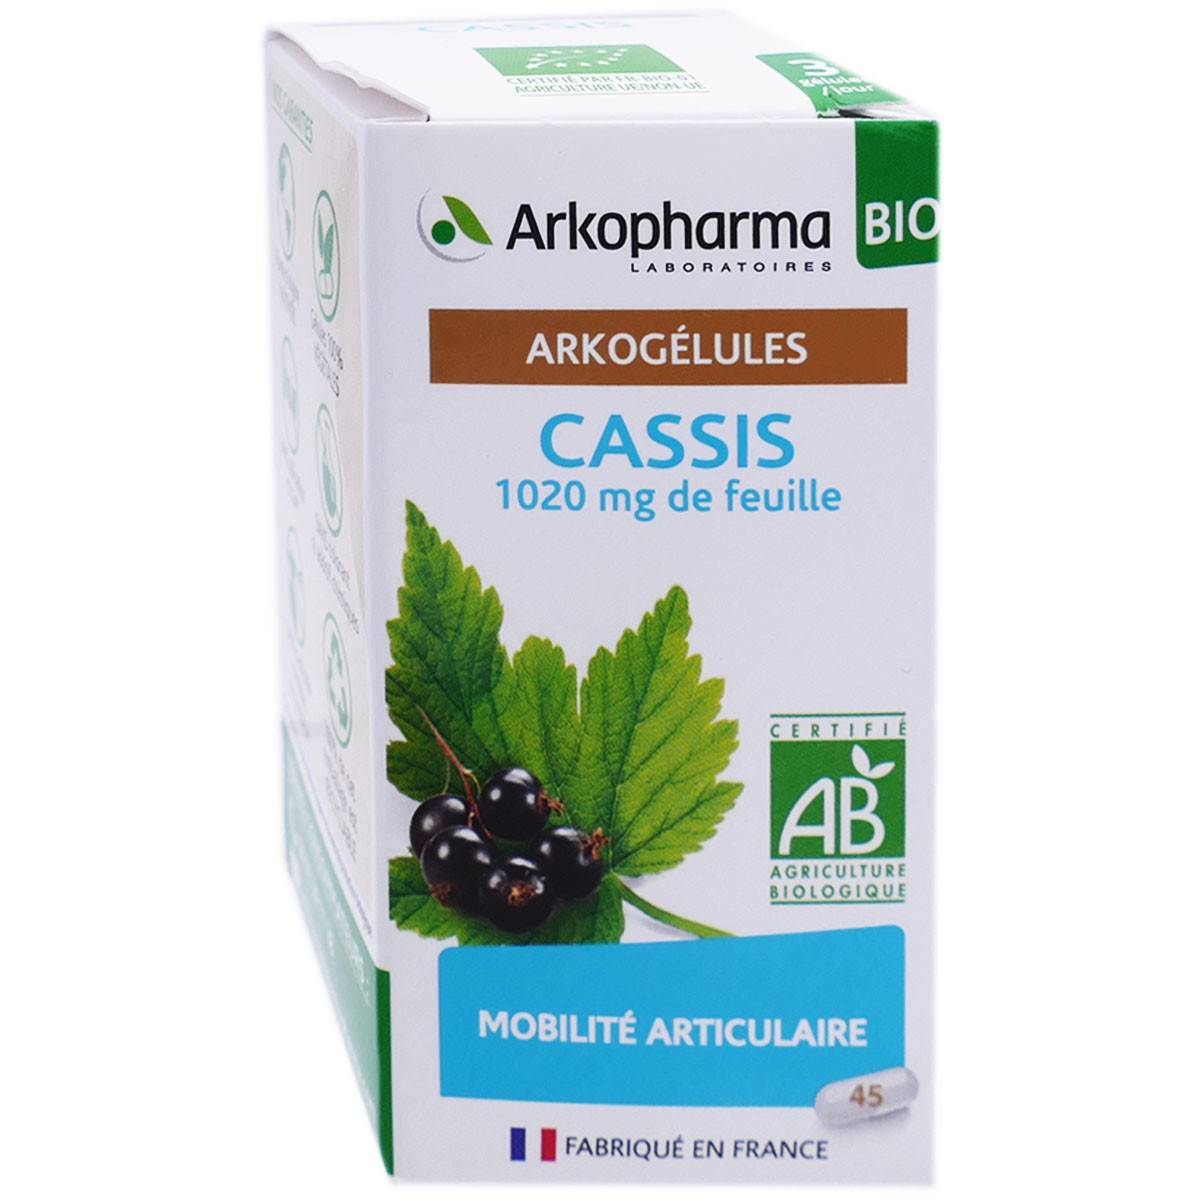 Arkopharma arkogelules bio cassis 45 gelules